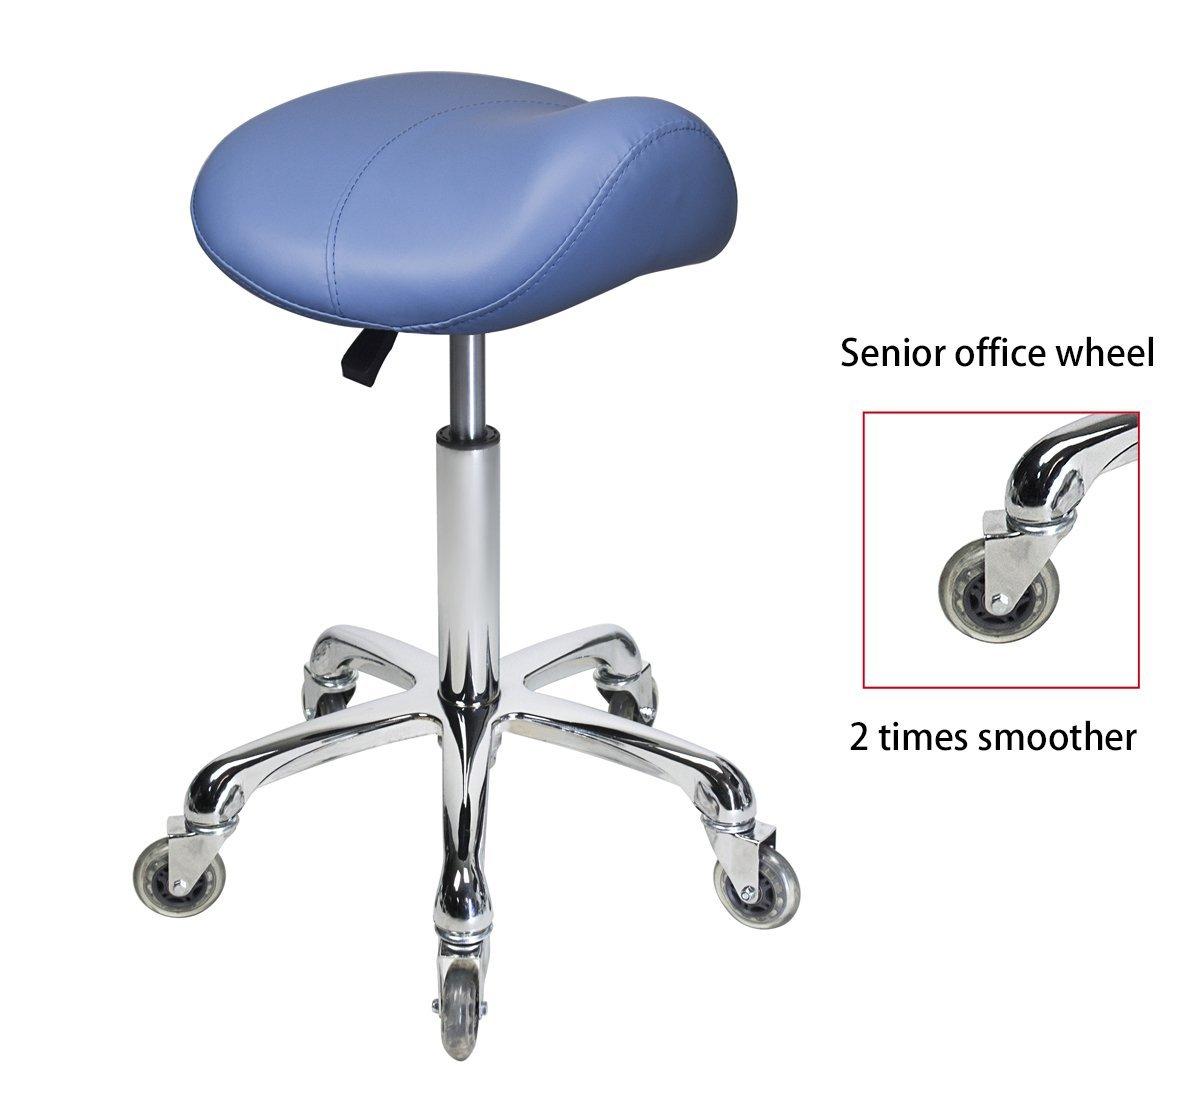 Antlu Saddle Stool Rolling Ergonomic Swivel Chair, for Drafting Massage Clinic Spa Salon,Adjustable Hydraulic with Wheels (Blue) by Antlu (Image #2)